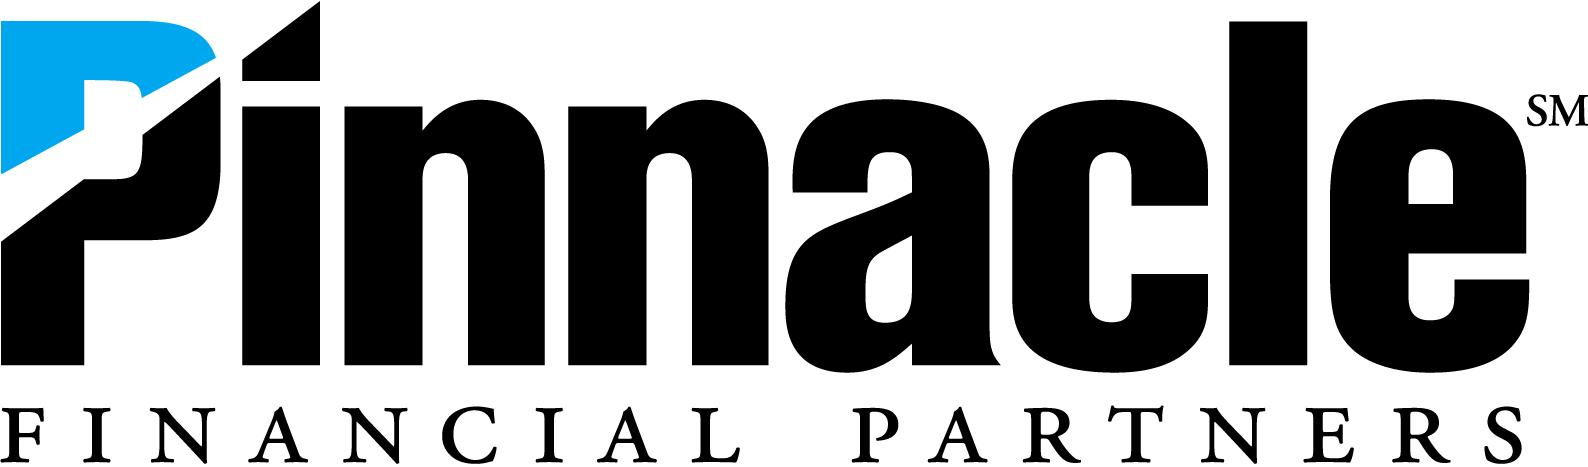 Pinnacle Financial Partners Logo